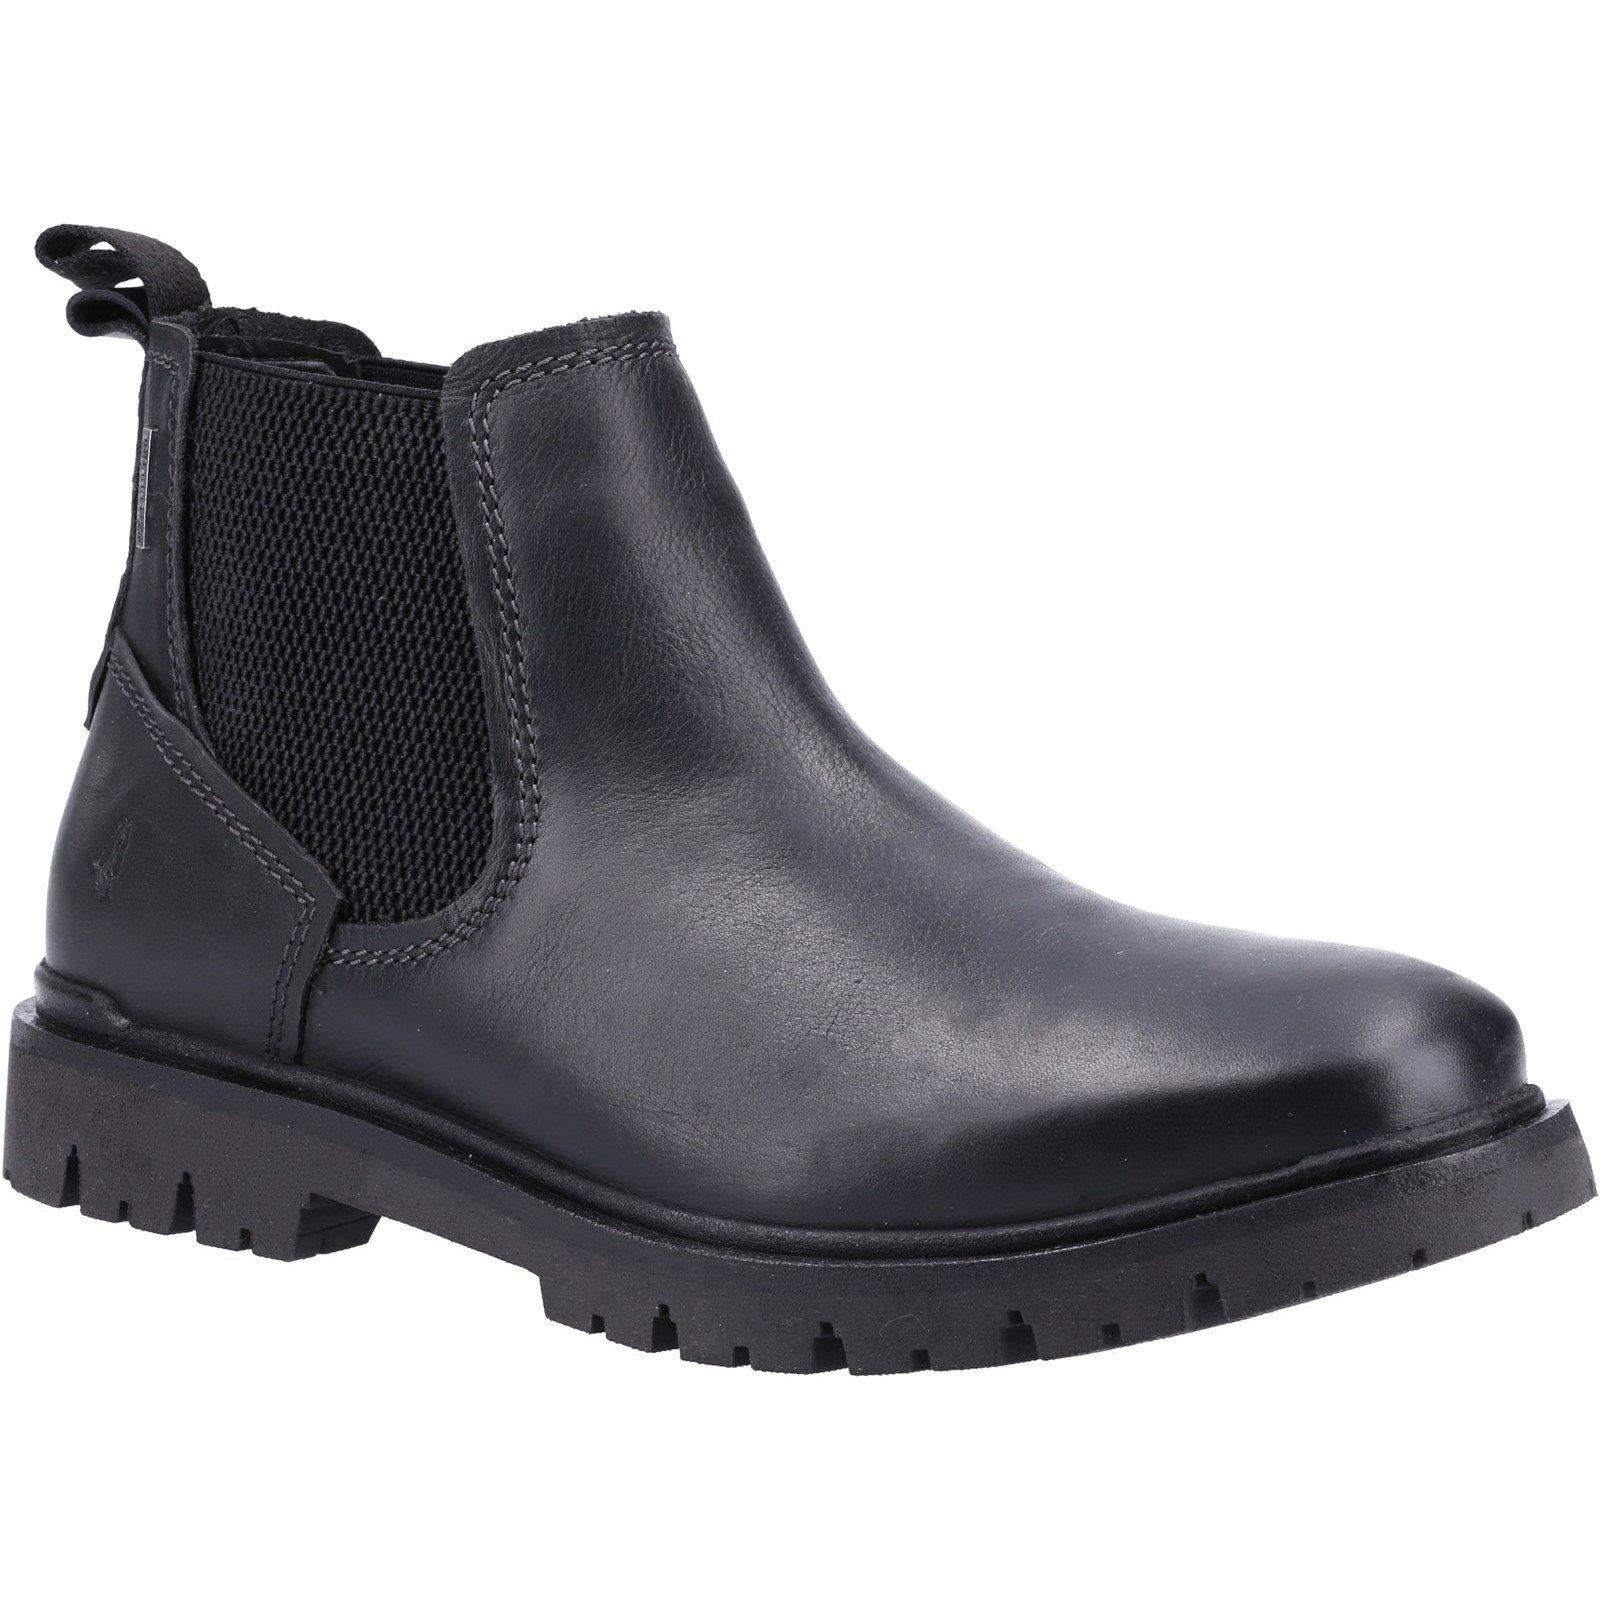 Hush Puppies Men's Paxton Chelsea Boot Various Colours 32882 - Black 12